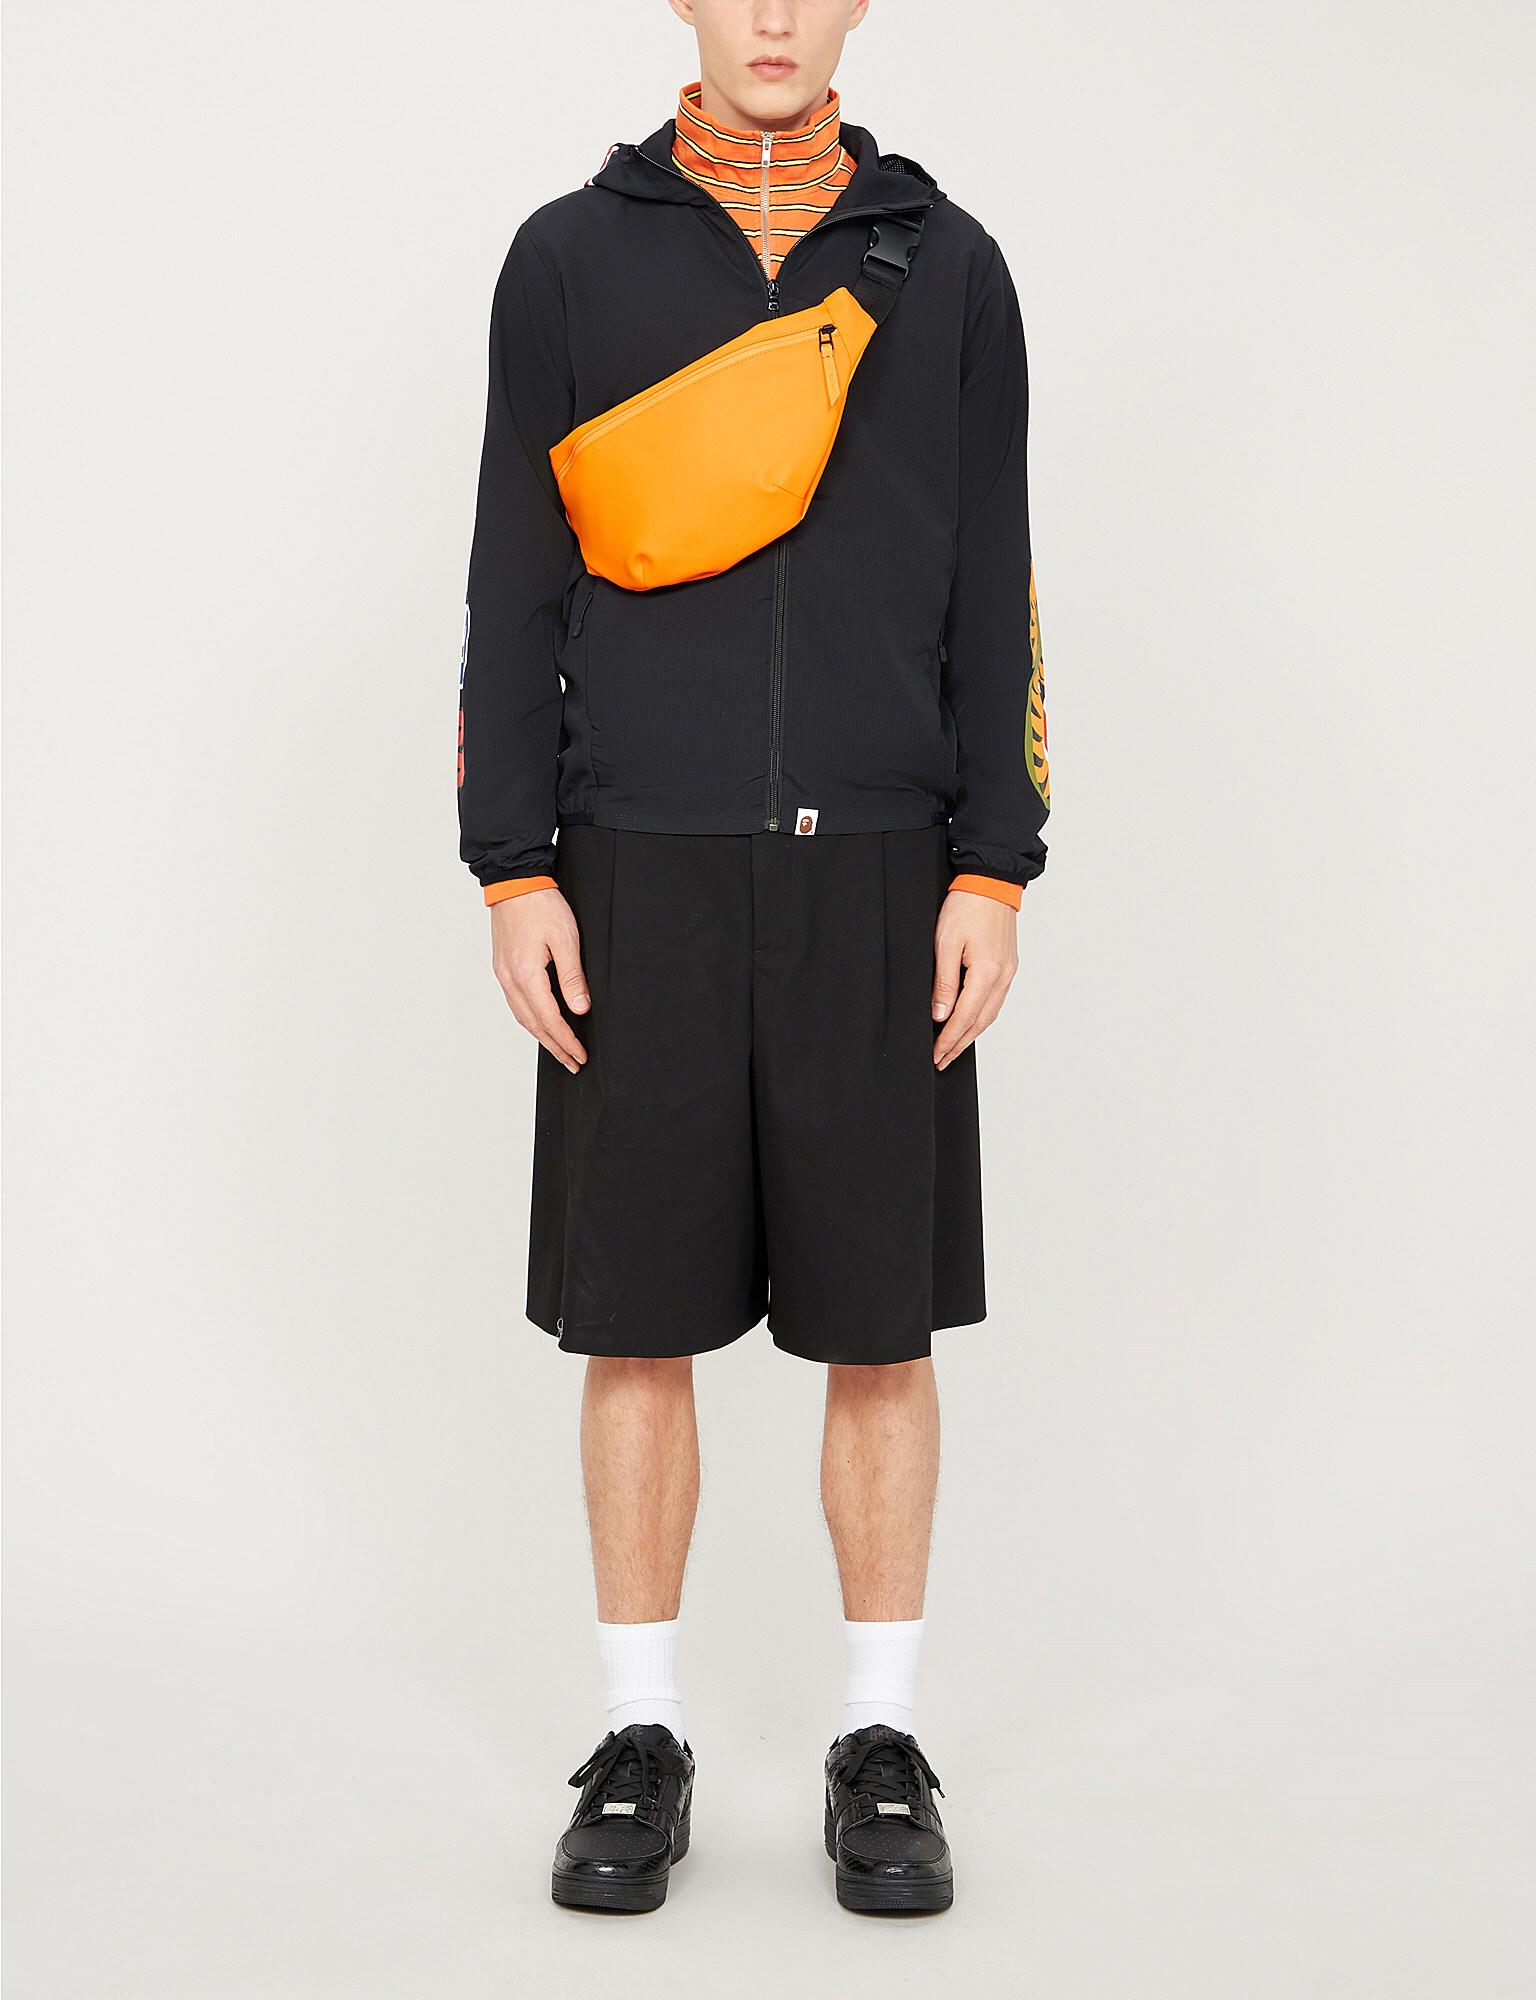 325164d4742 A Bathing Ape Shark Hooded Shell Jacket in Black for Men - Lyst